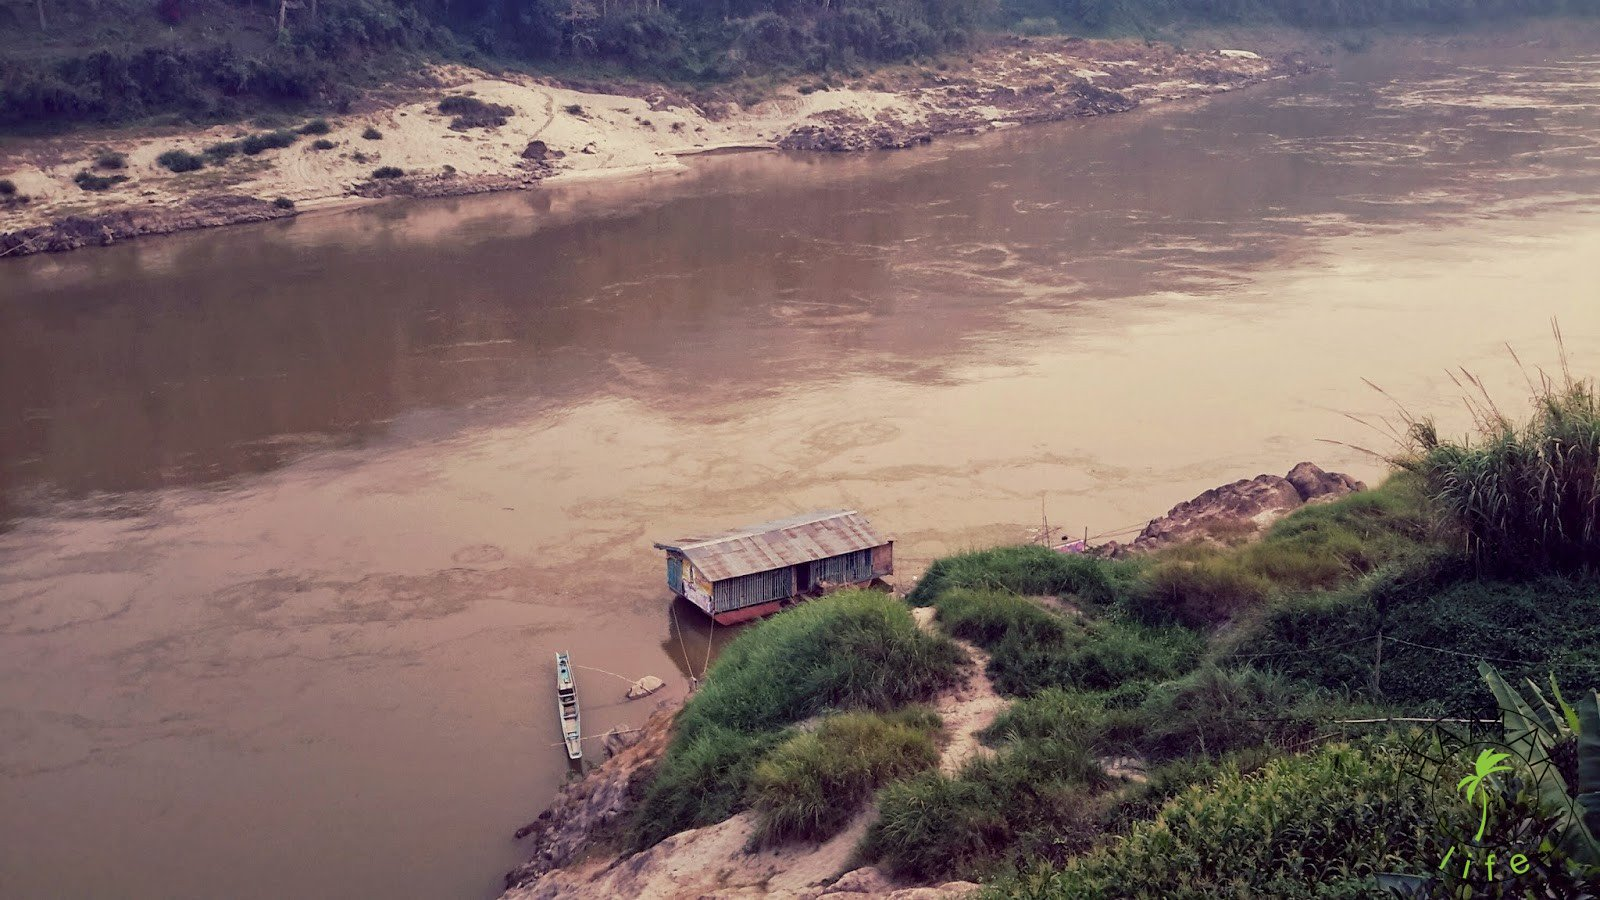 Mekong w Laosie 2015